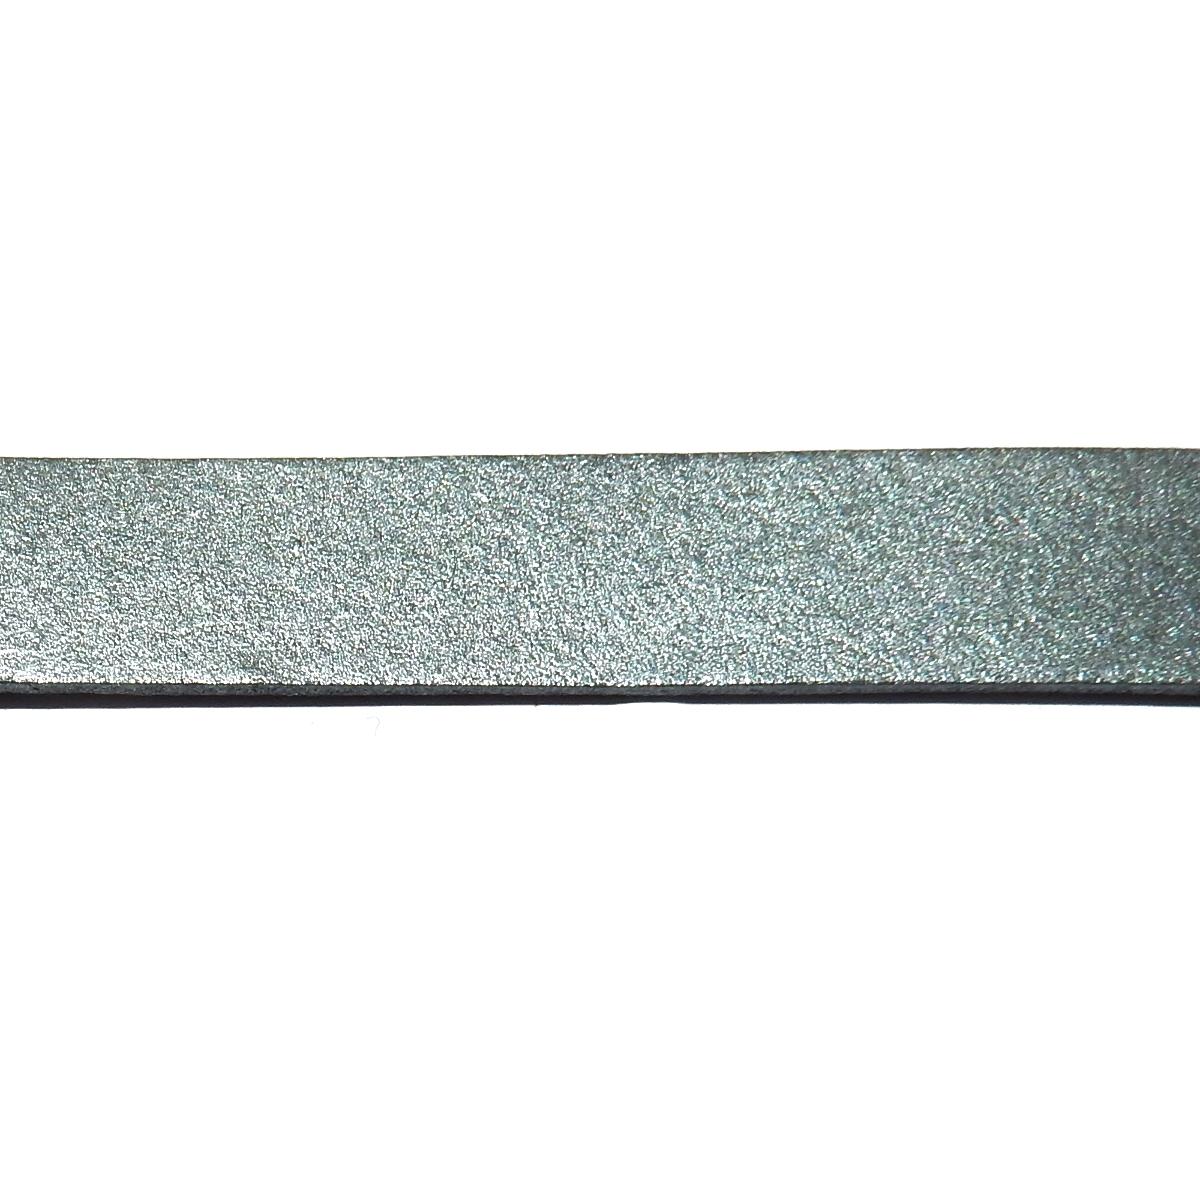 Flat Leather Cord 10mm - Dark Grey